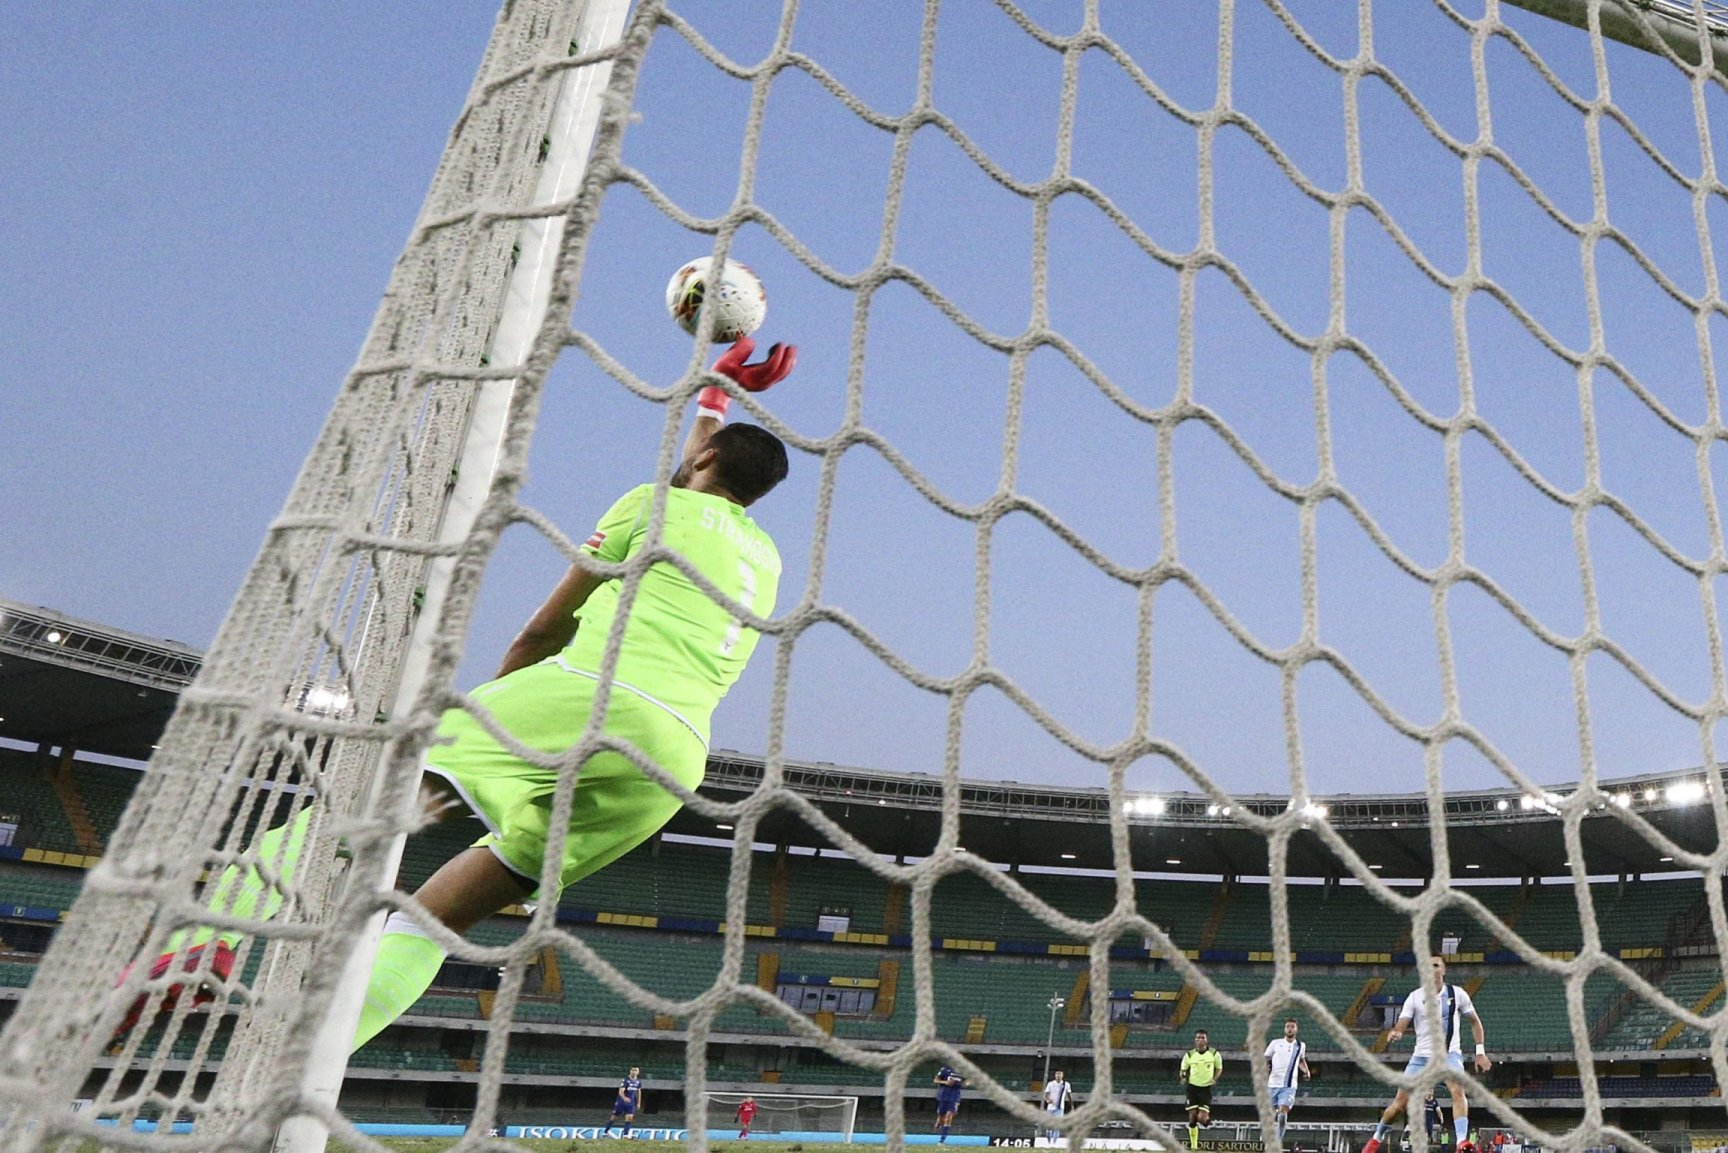 Diritti Tv Serie A, Wanda e Mediapro propongono a club partnership su canale